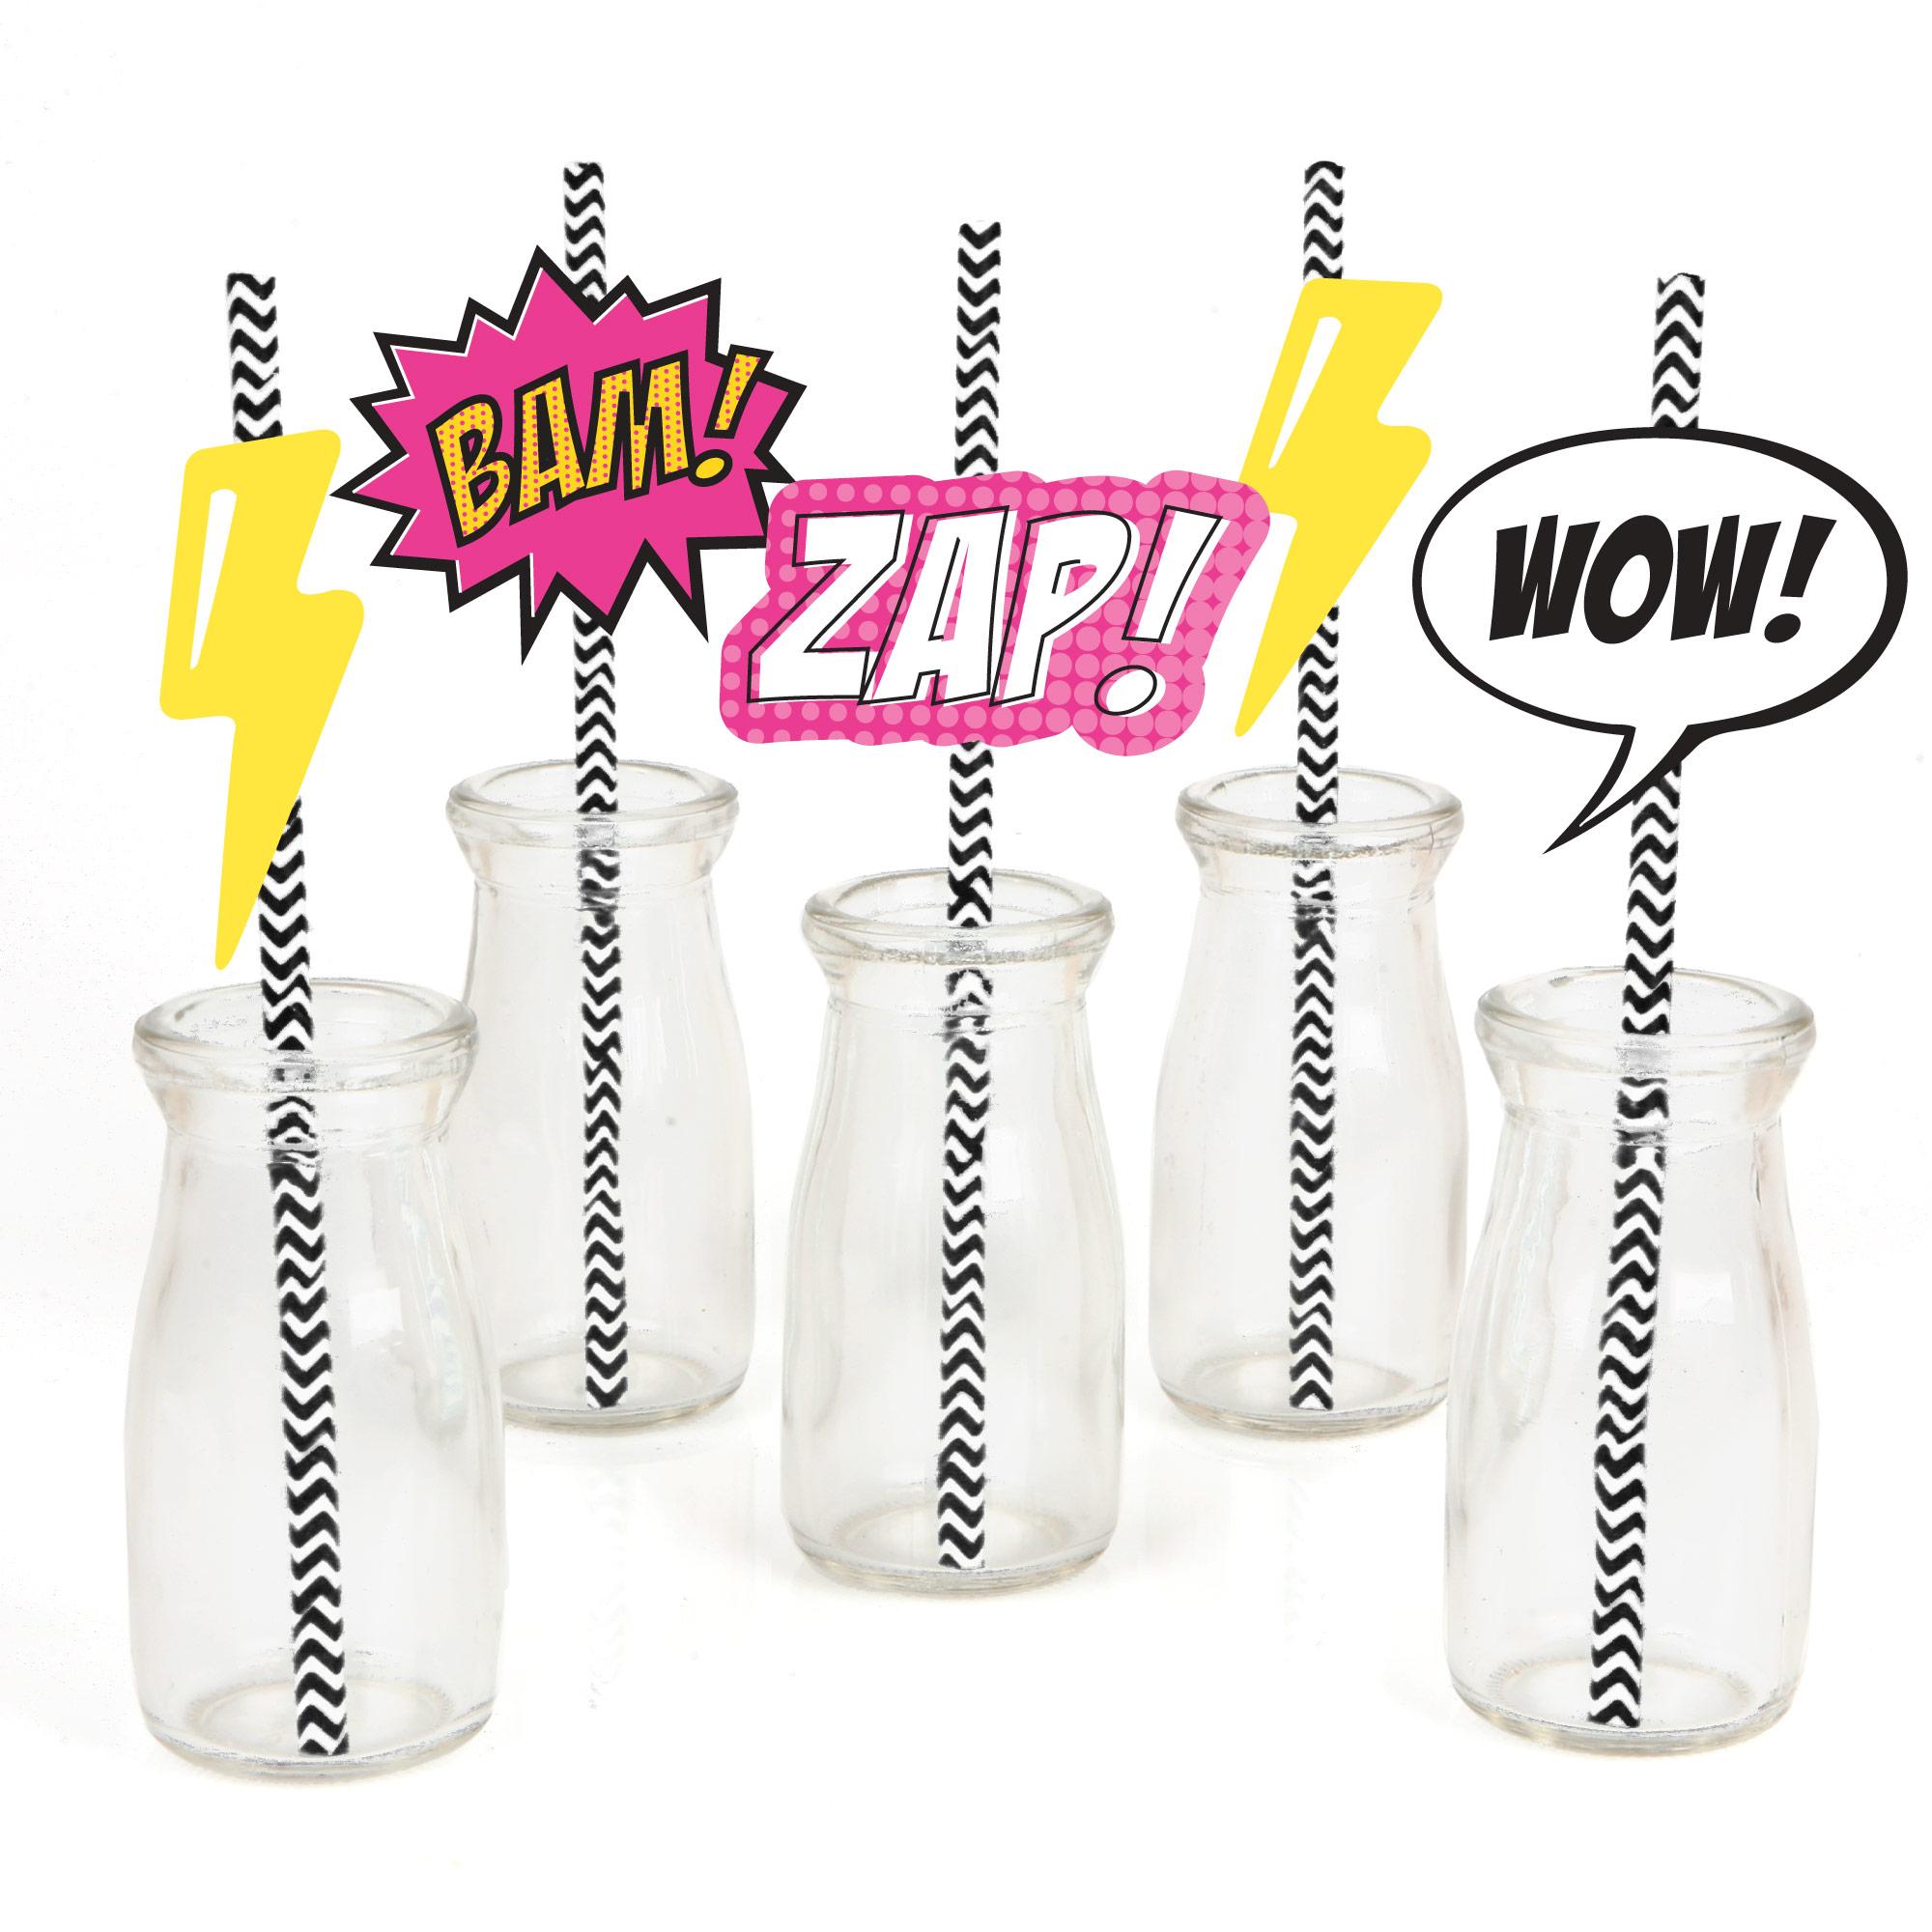 BAM! Girl Superhero - Paper Straw Decor - Baby Shower or Birthday Party Striped Decorative Straws - Set of 24